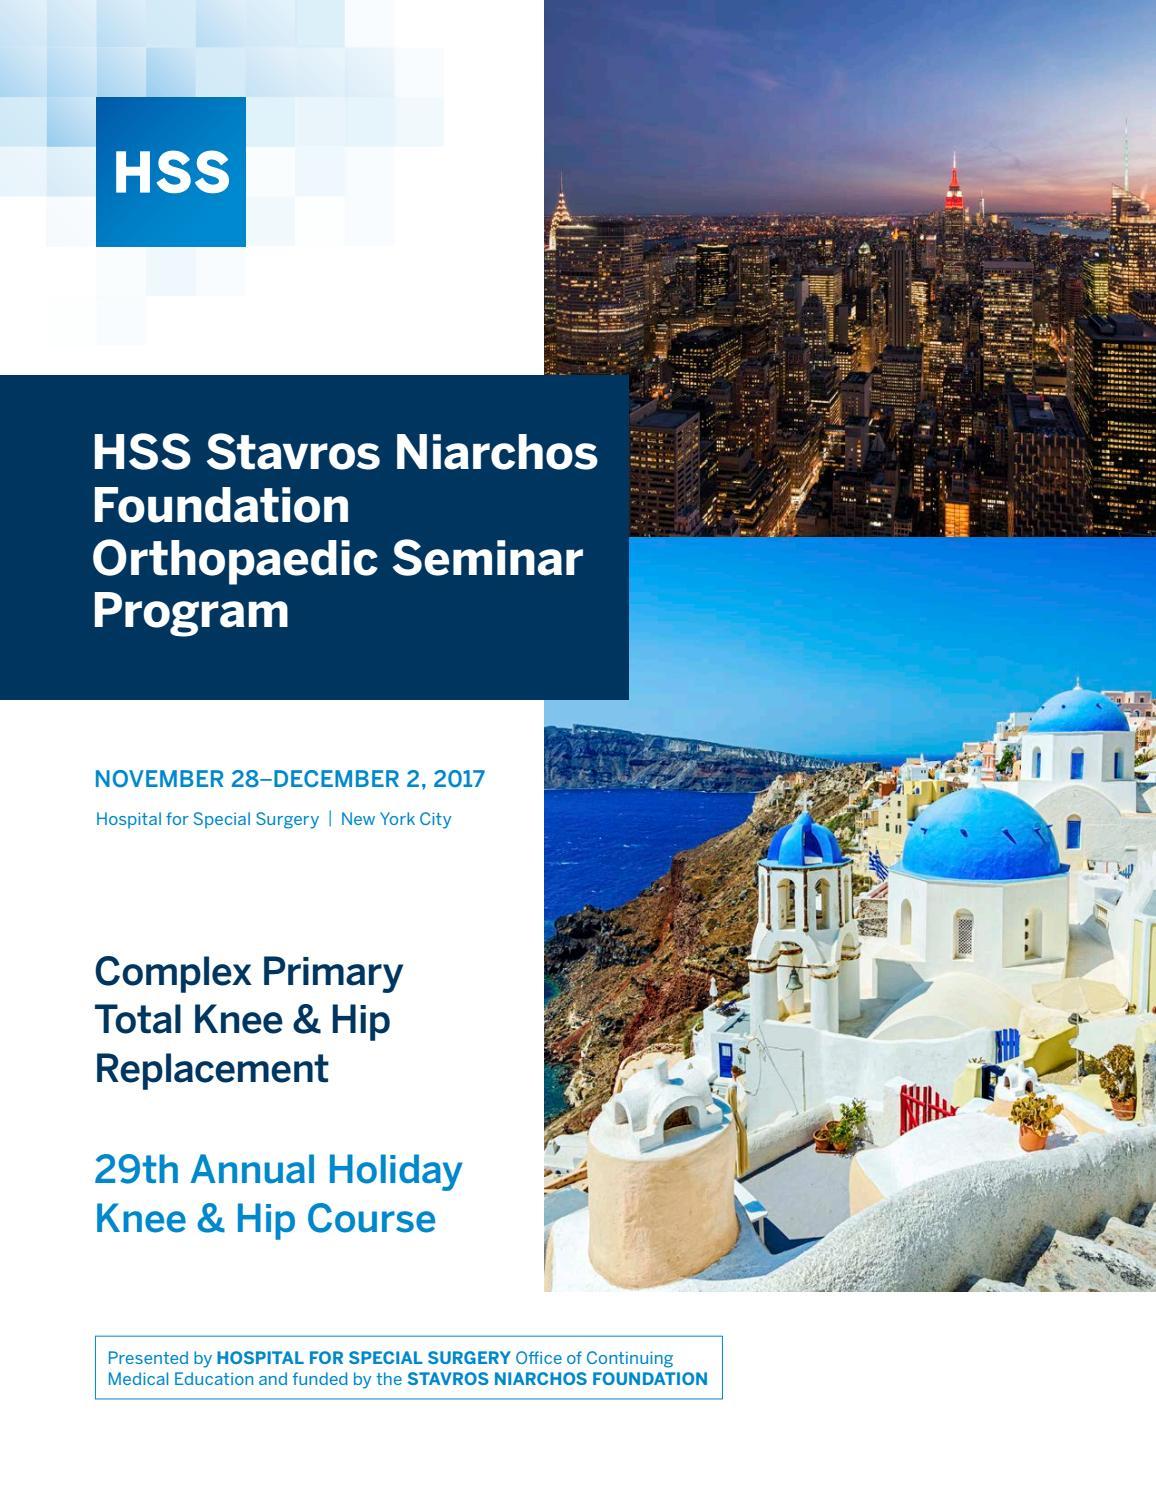 HSS Stavros Niarchos Foundation Orthopaedic Seminar Program